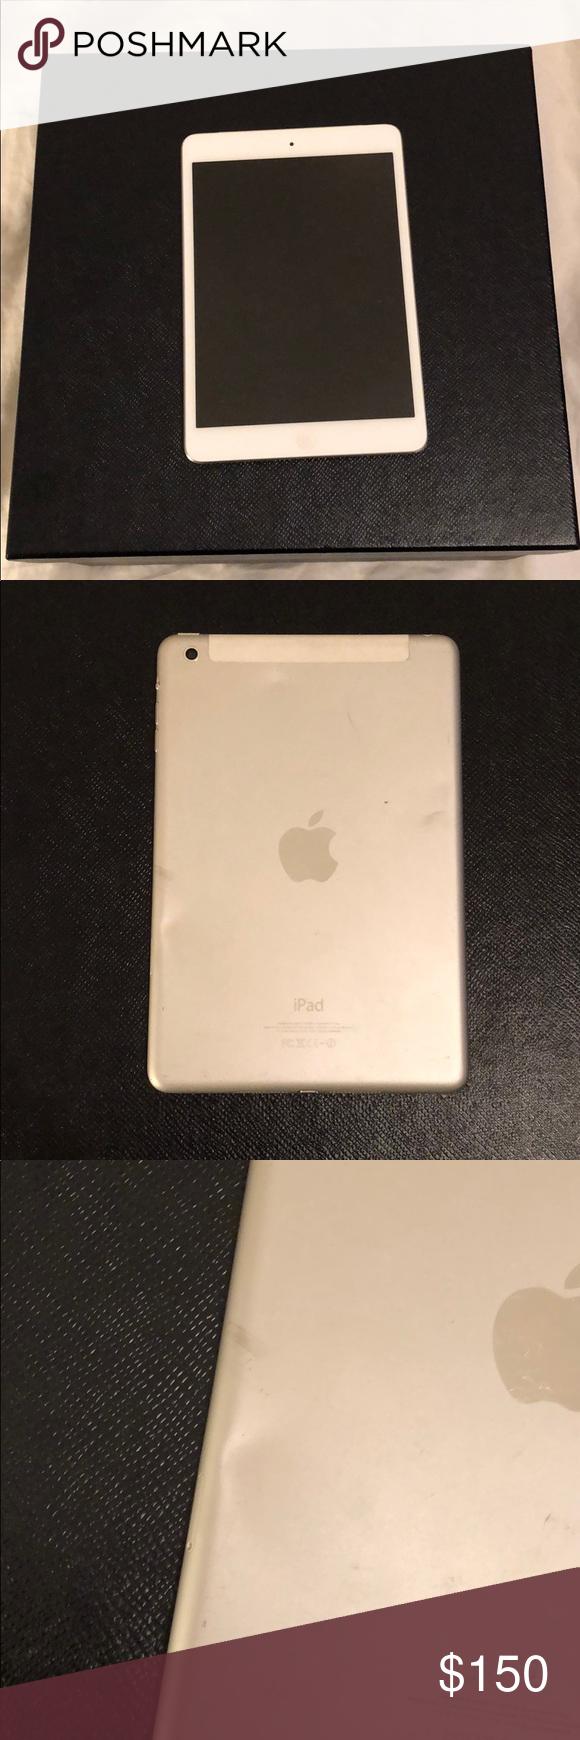 White Ipad Mini White Ipad Mini Used Small Dent On Back But I M Pretty Good Shape Otherwise Apple Other Ipad Mini Ipad Mini